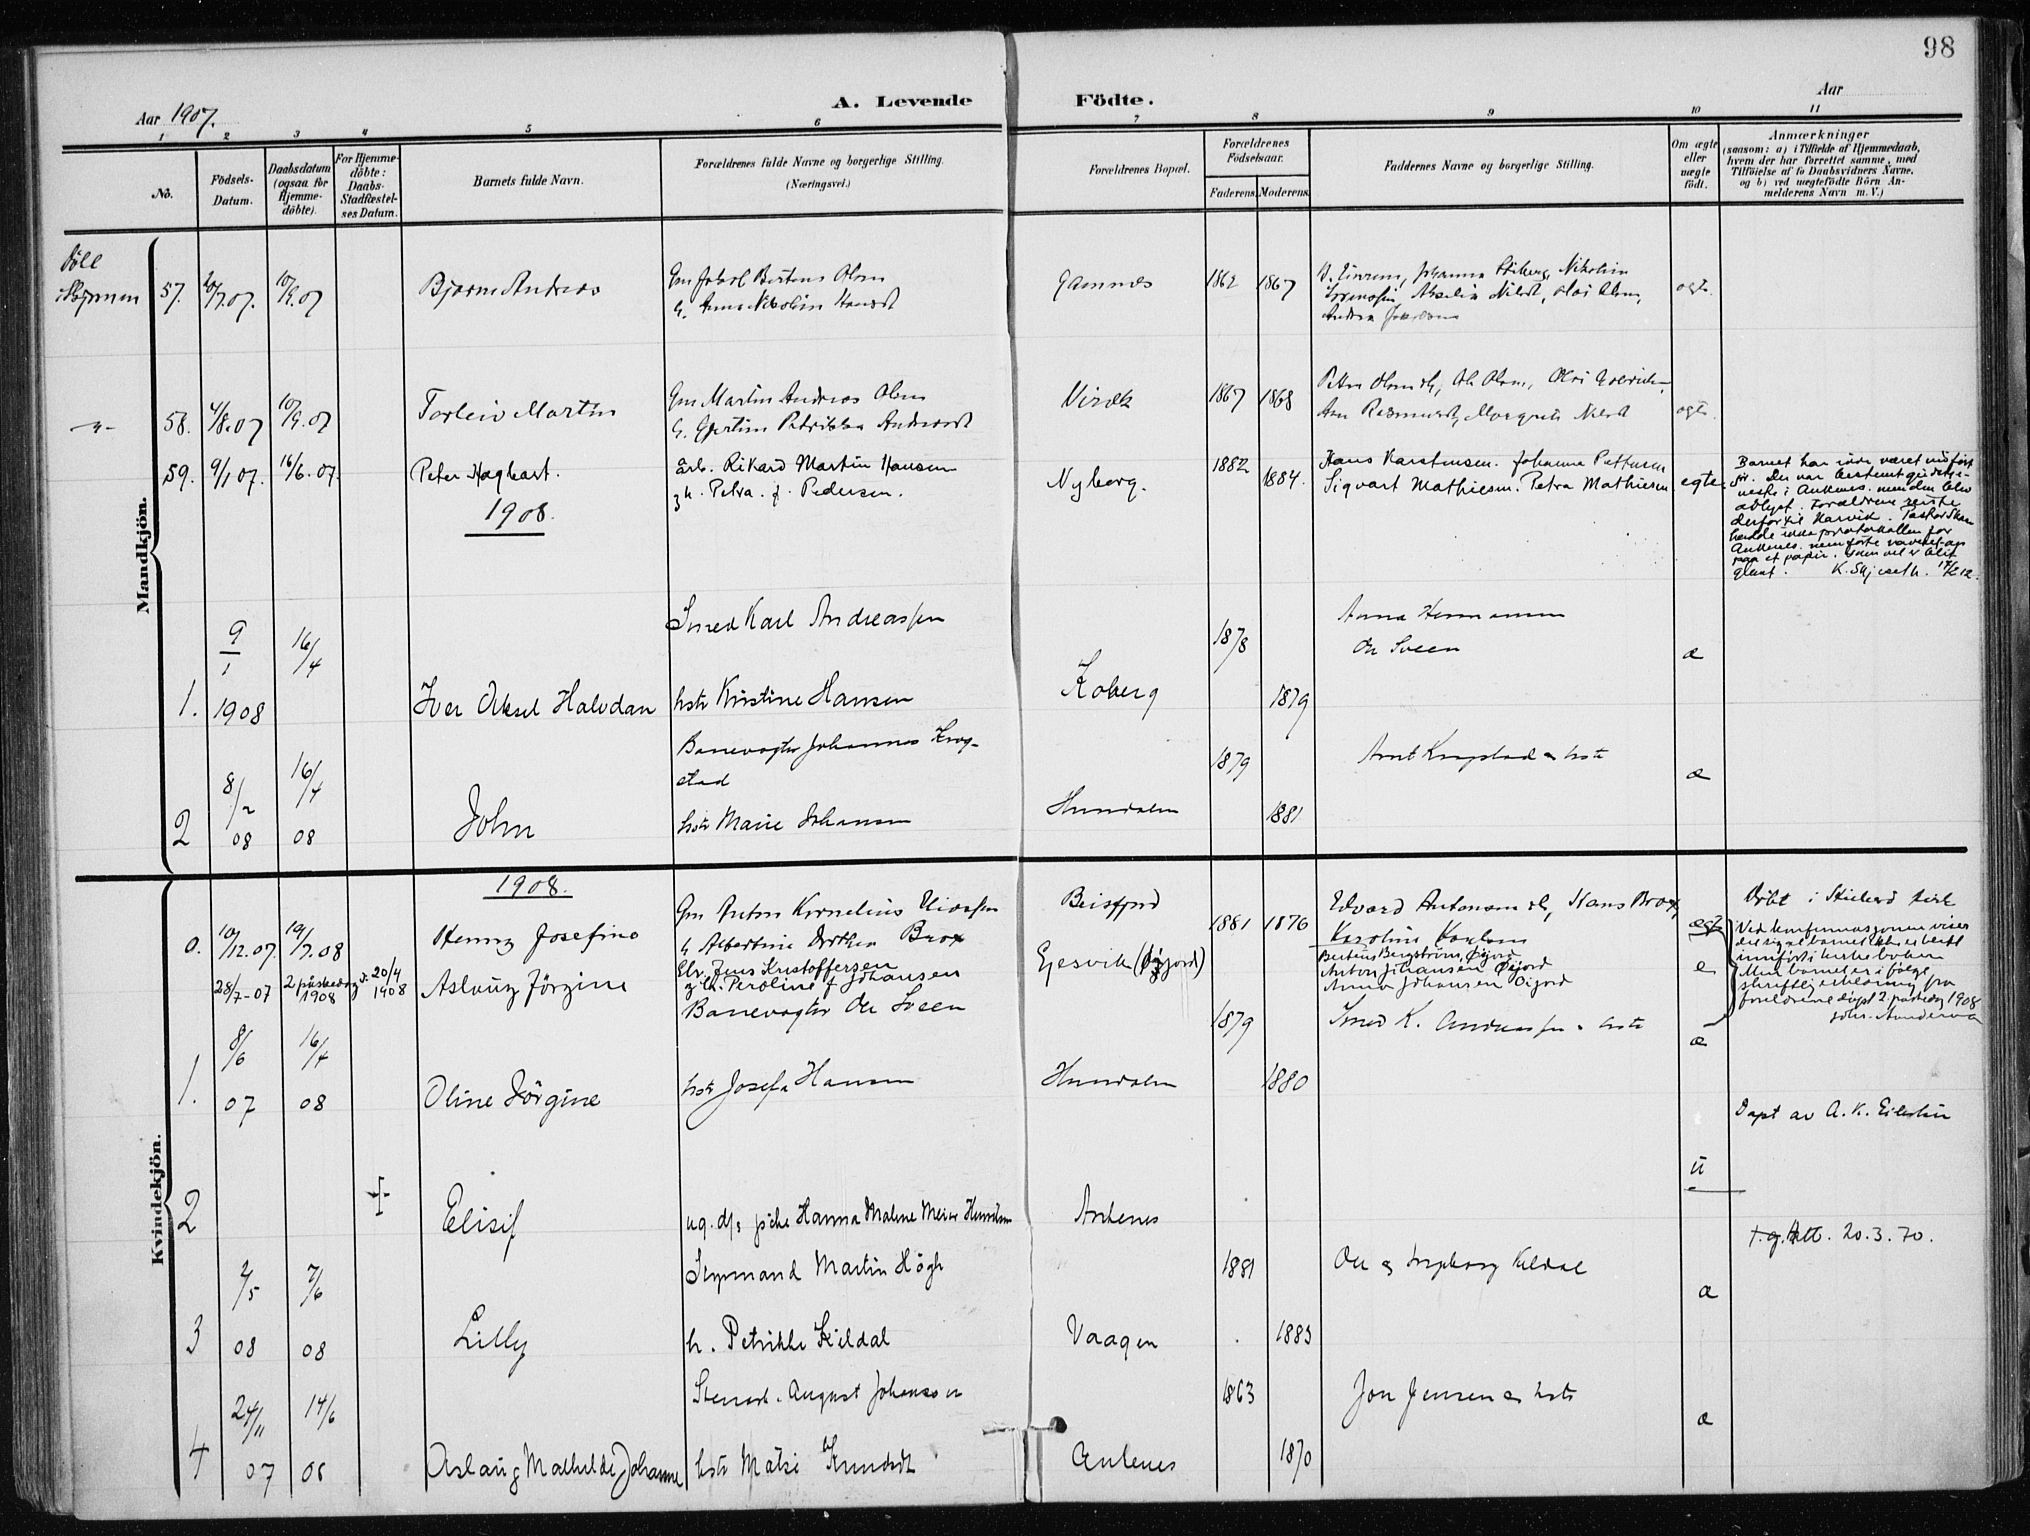 SAT, Ministerialprotokoller, klokkerbøker og fødselsregistre - Nordland, 866/L0941: Ministerialbok nr. 866A04, 1901-1917, s. 98